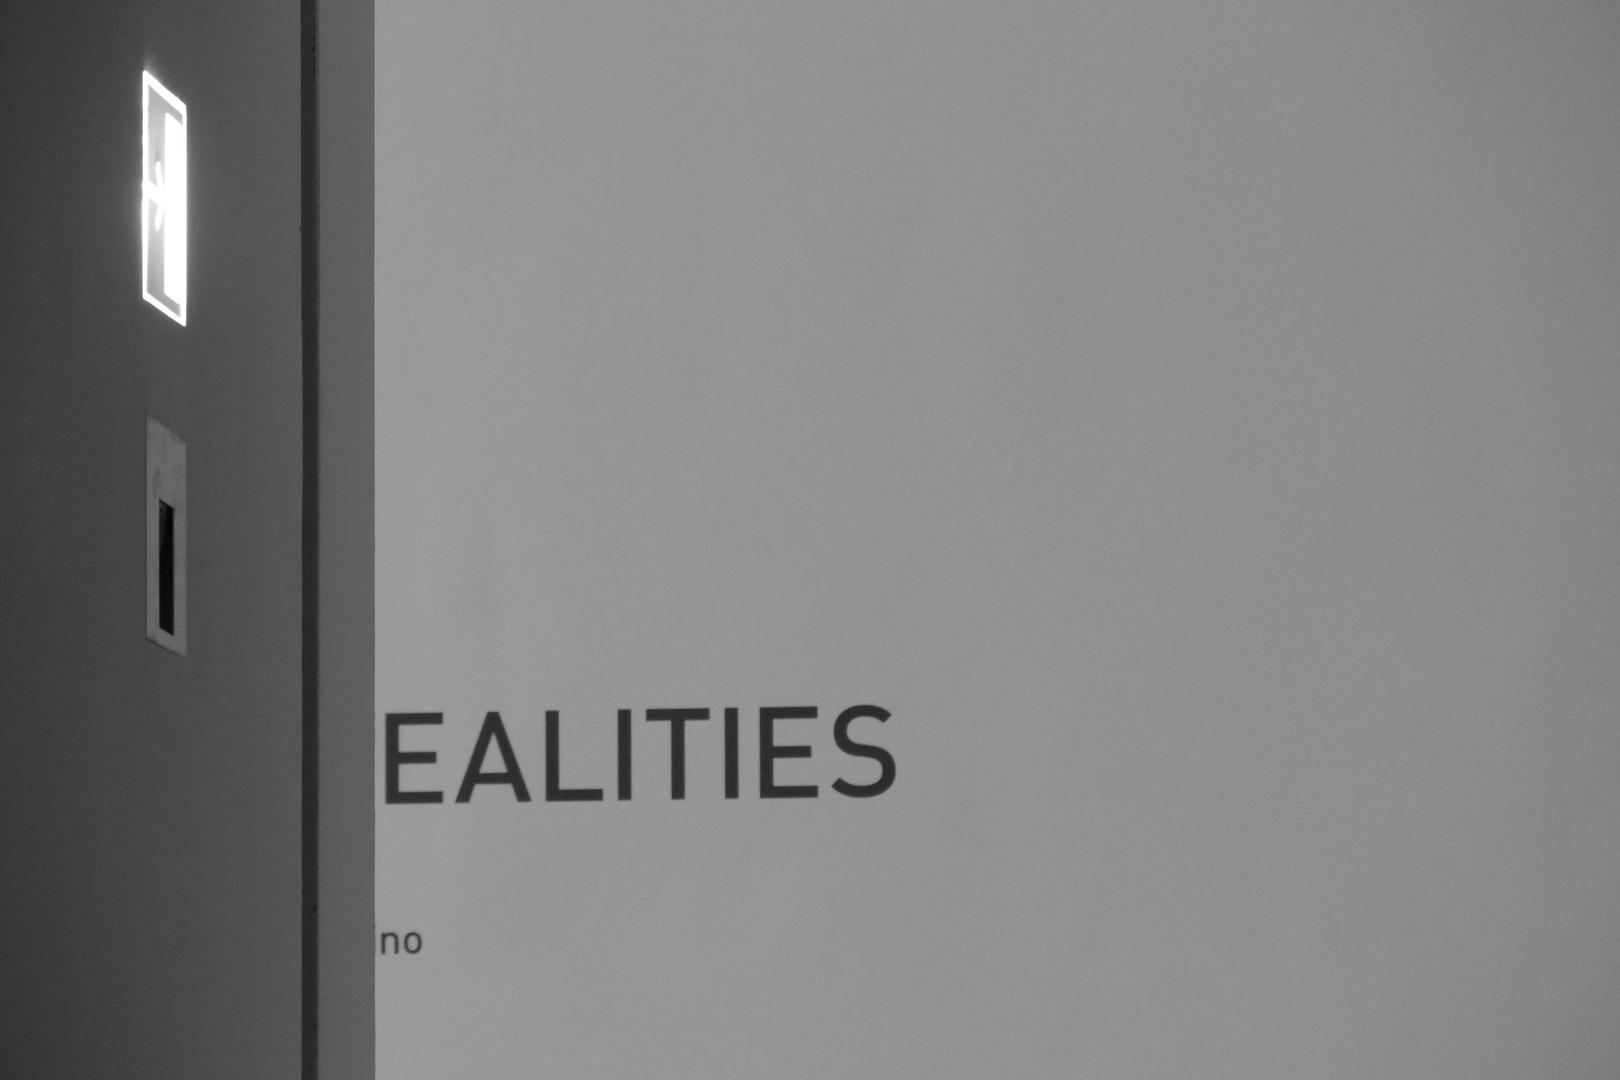 EALITIES no